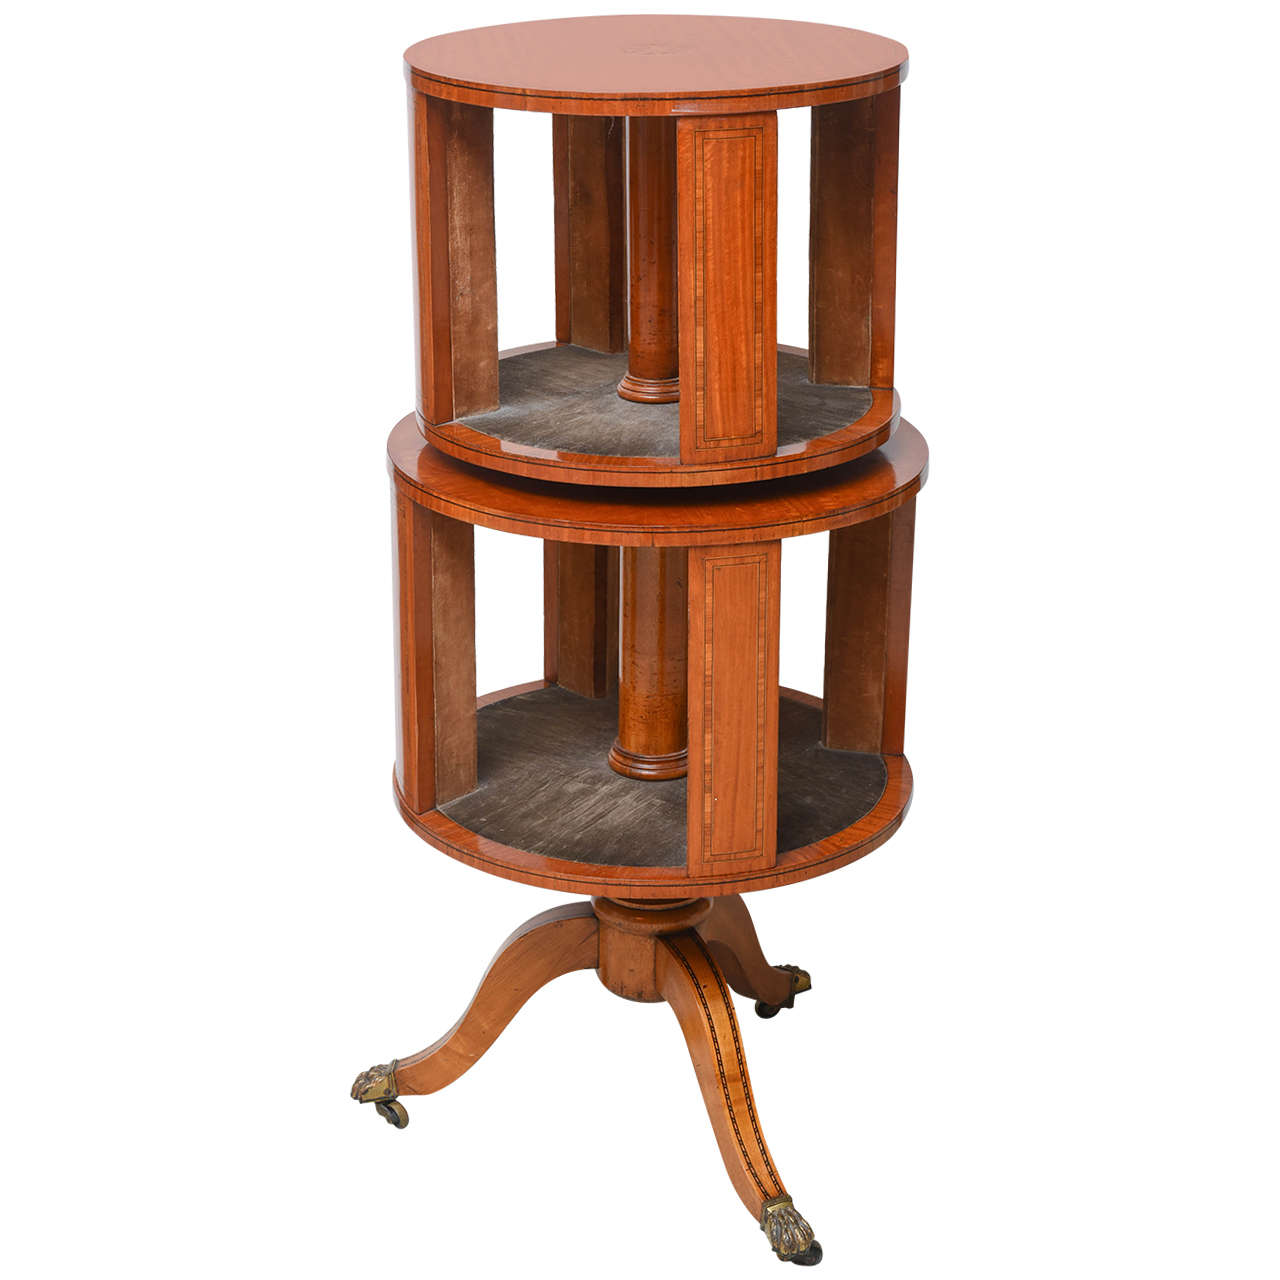 Regency Style Satinwood Revolving Circular Bookcase For Sale